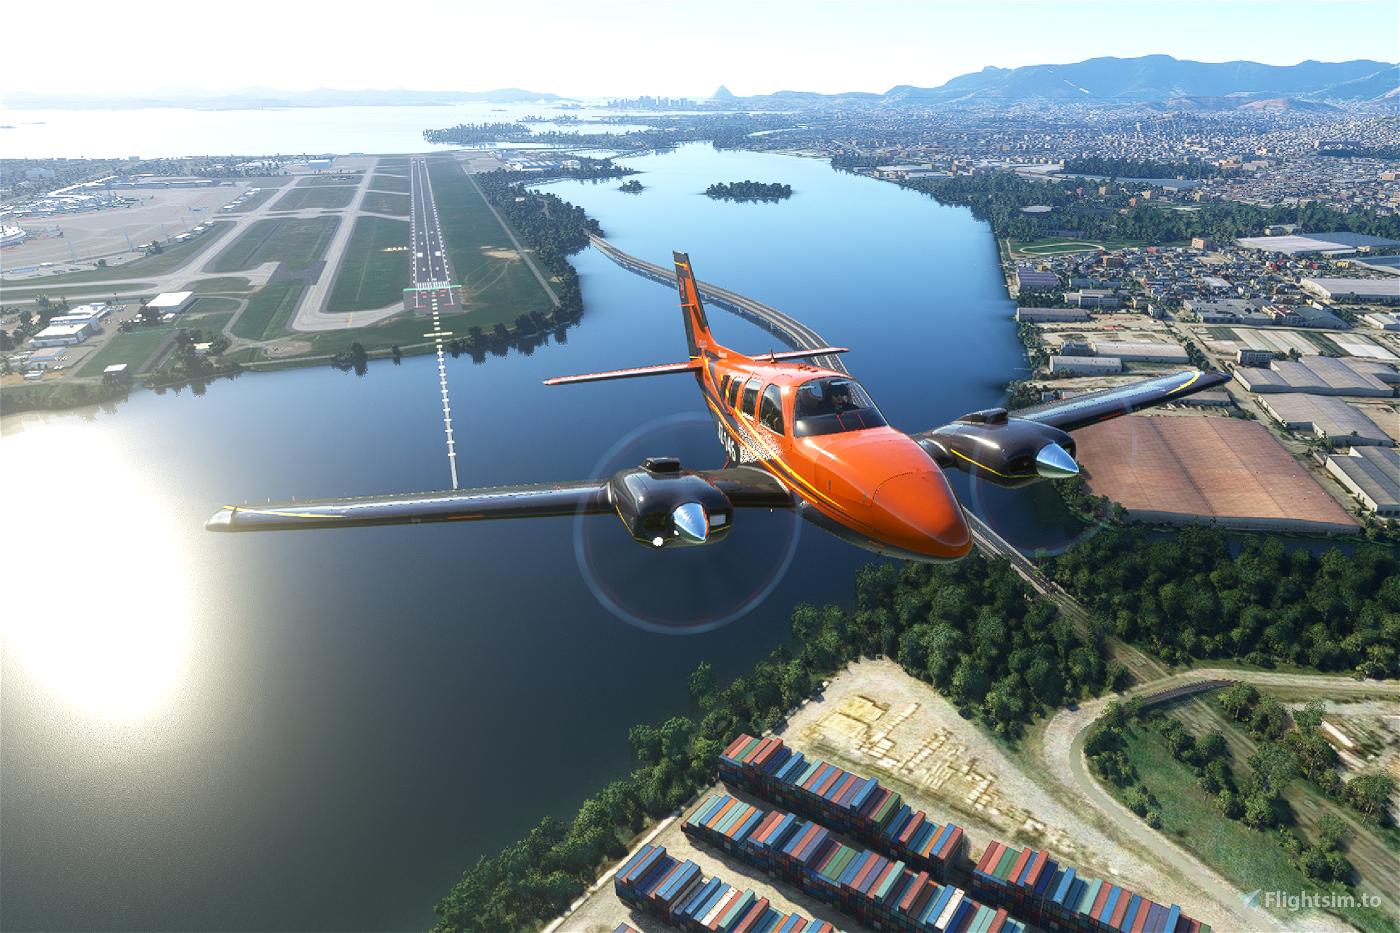 Beechcraft Baron G58 X series (now 9 colours) Flight Simulator 2020